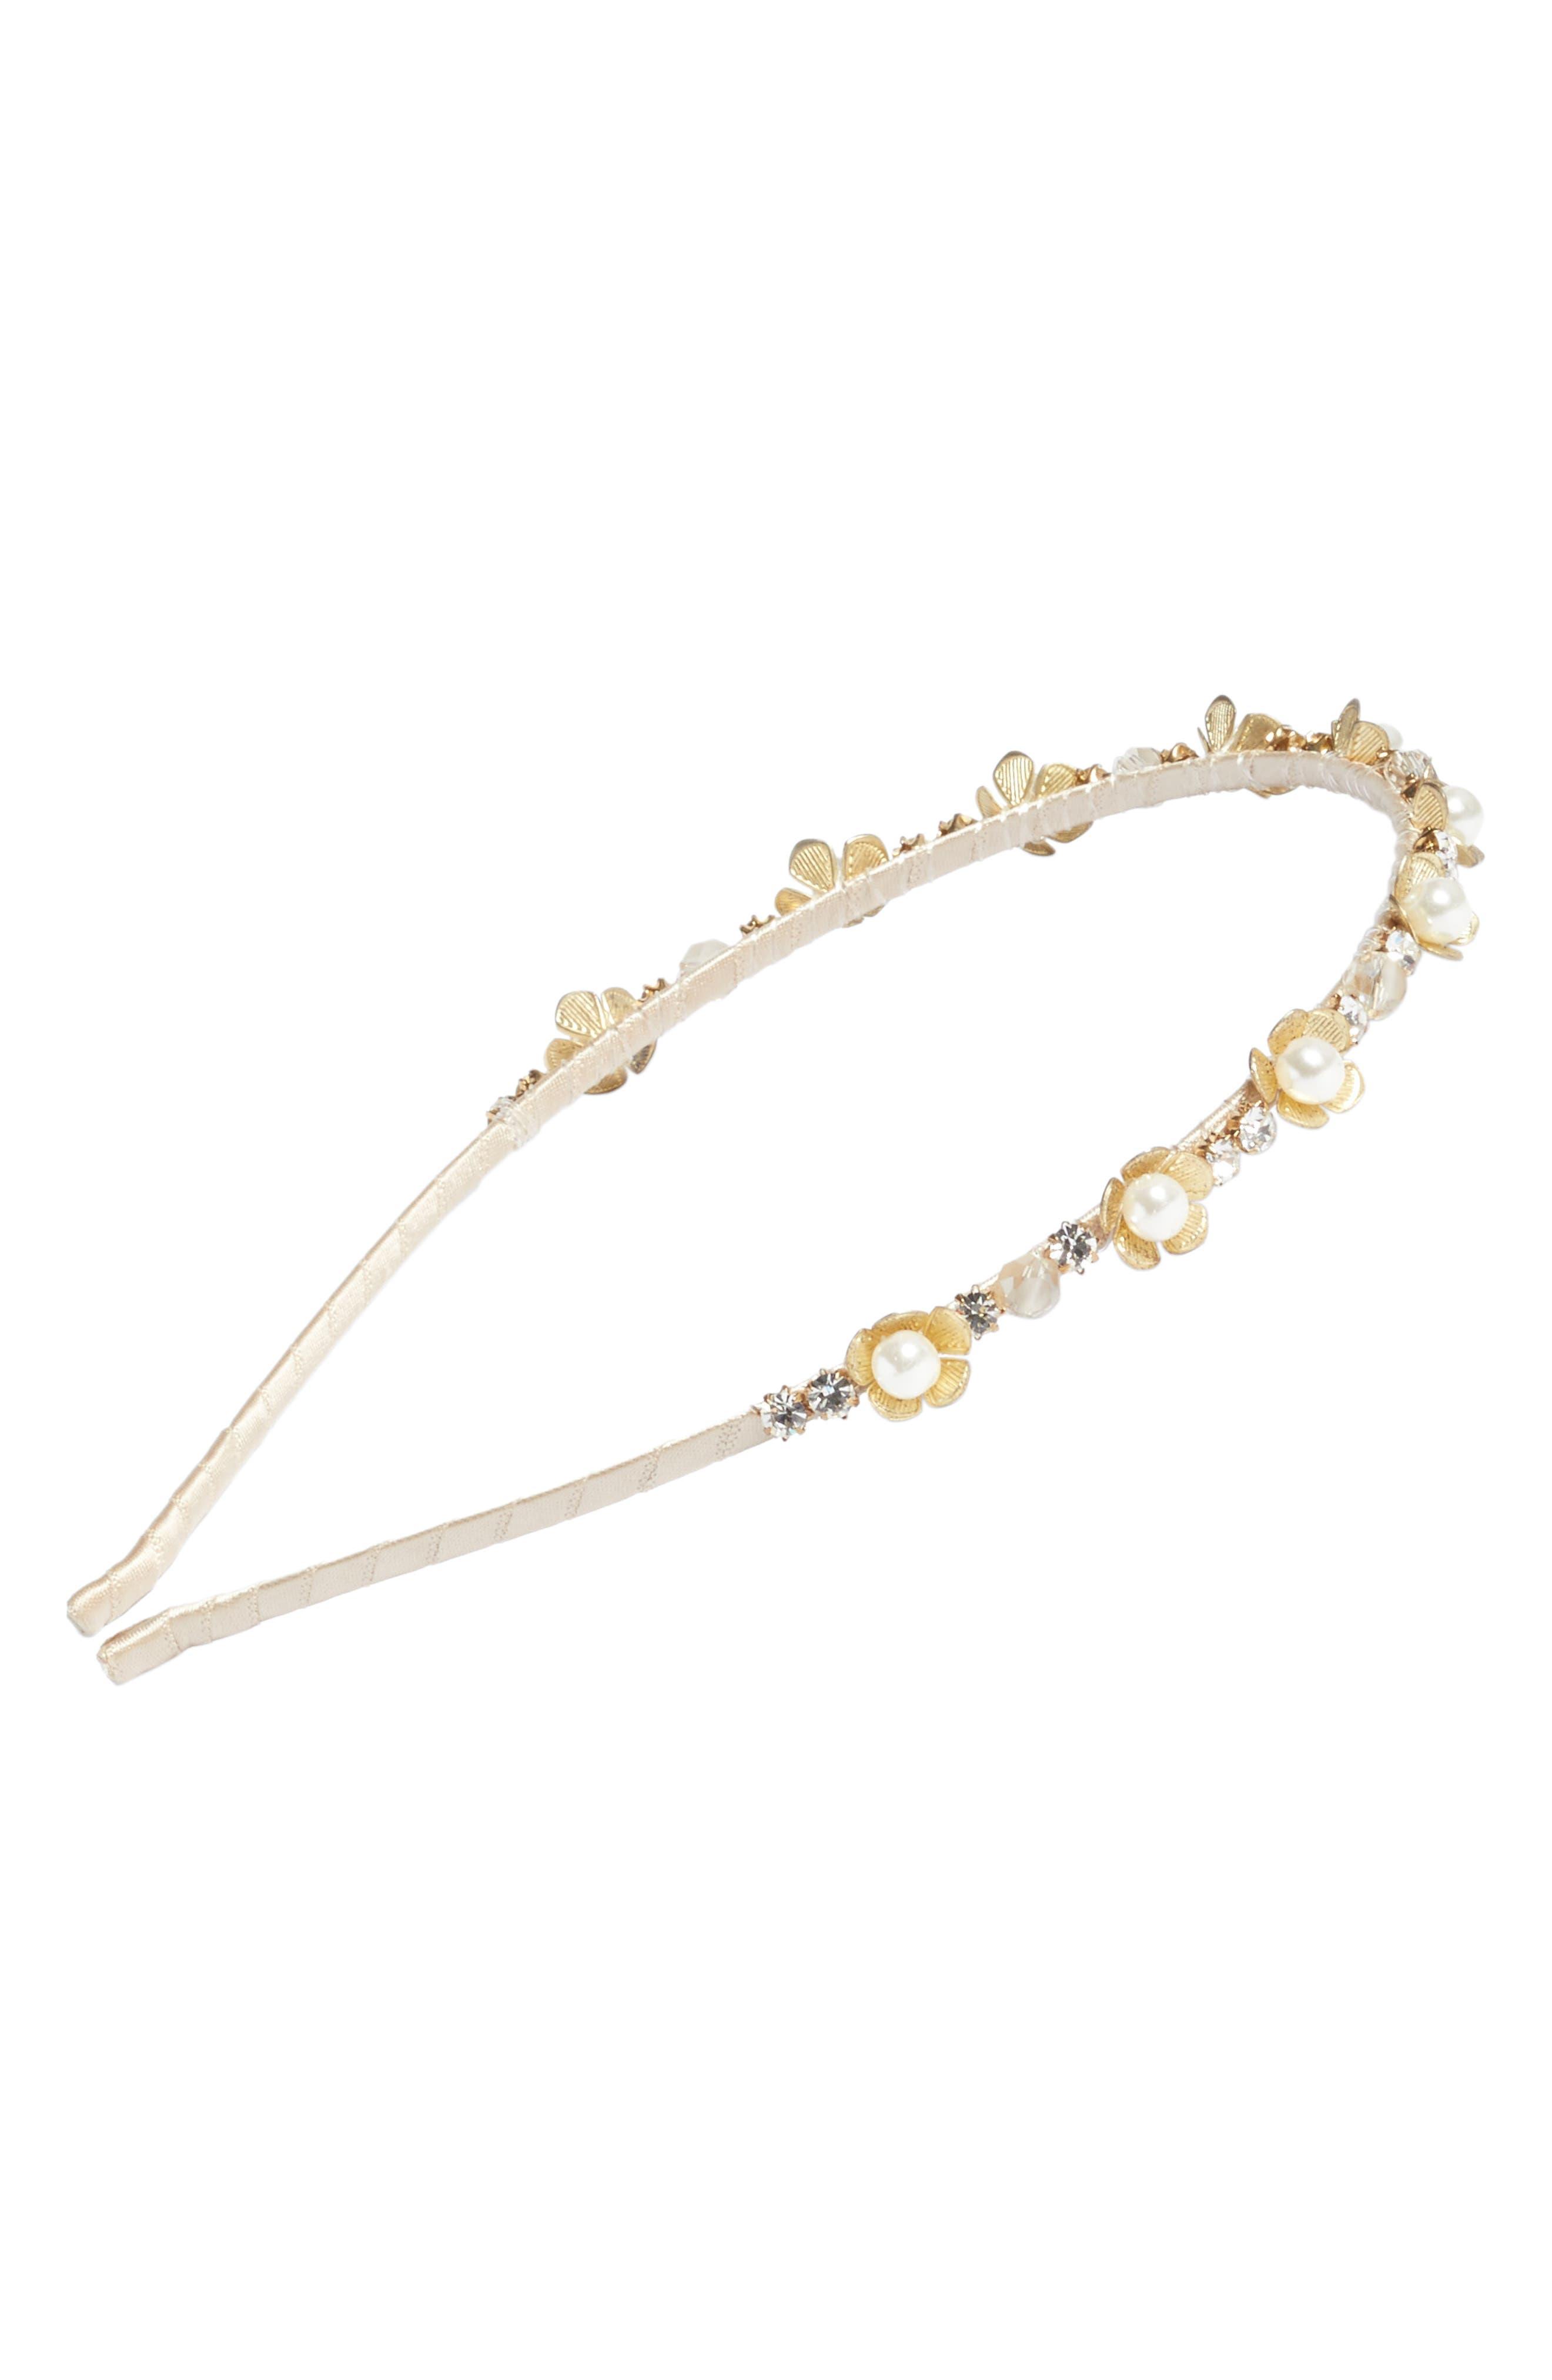 Rhinestone & Imitation Pearl Flower Headband,                         Main,                         color,